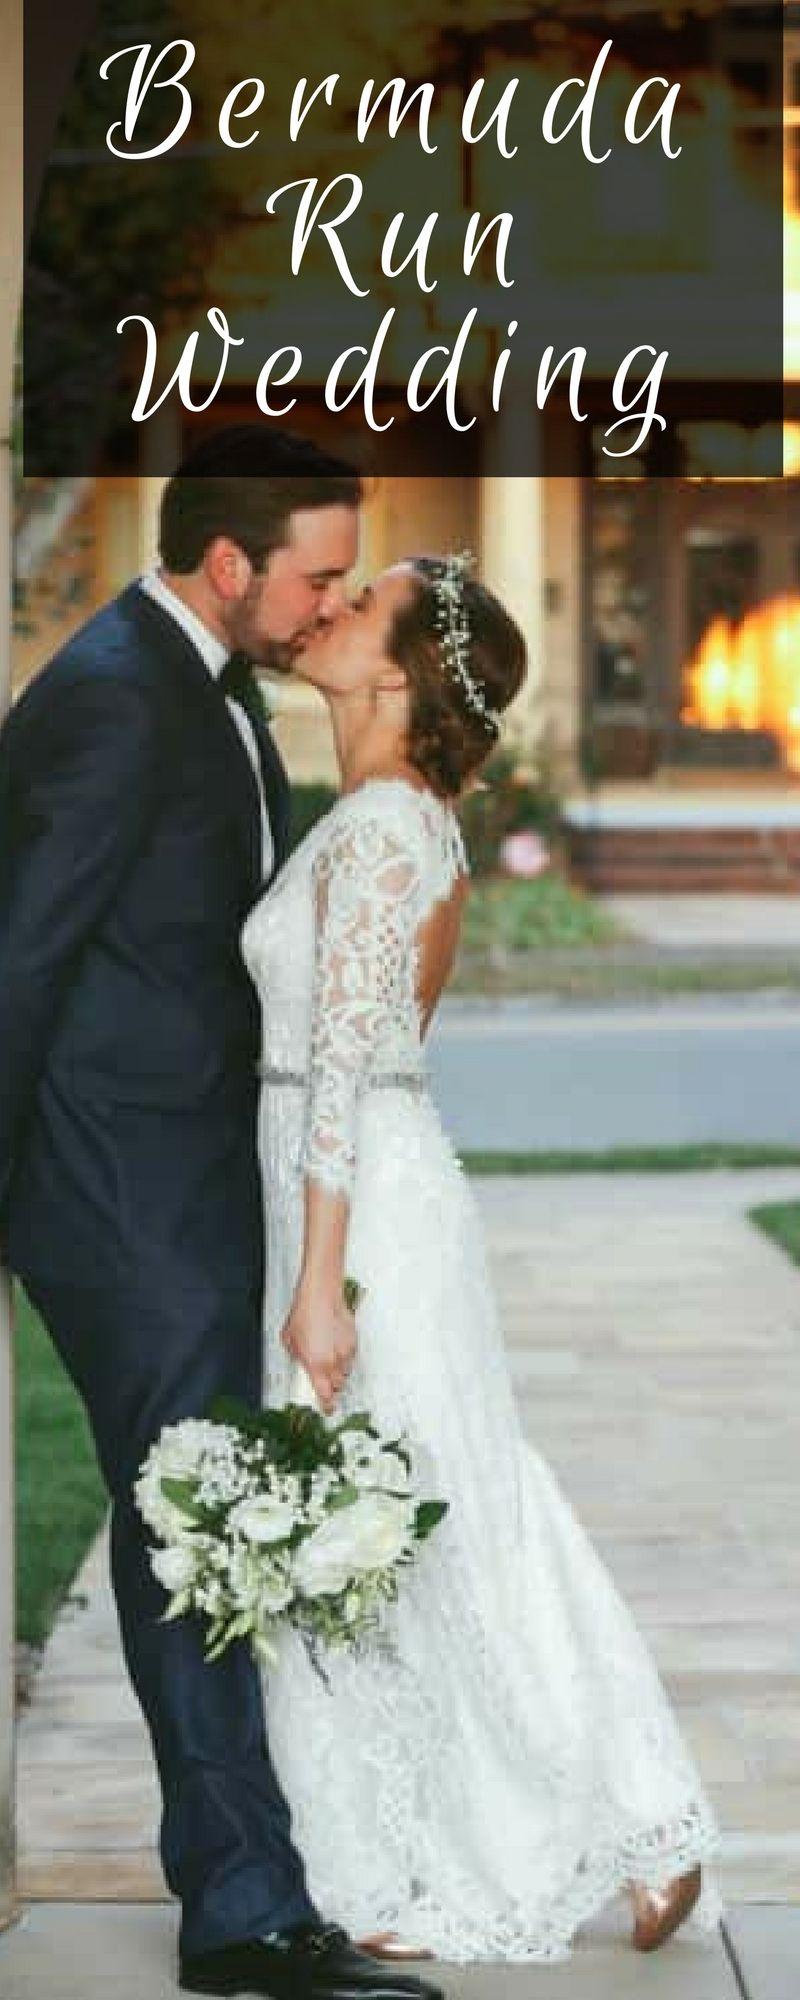 Bermuda run wedding weddings nontraditional wedding and diy